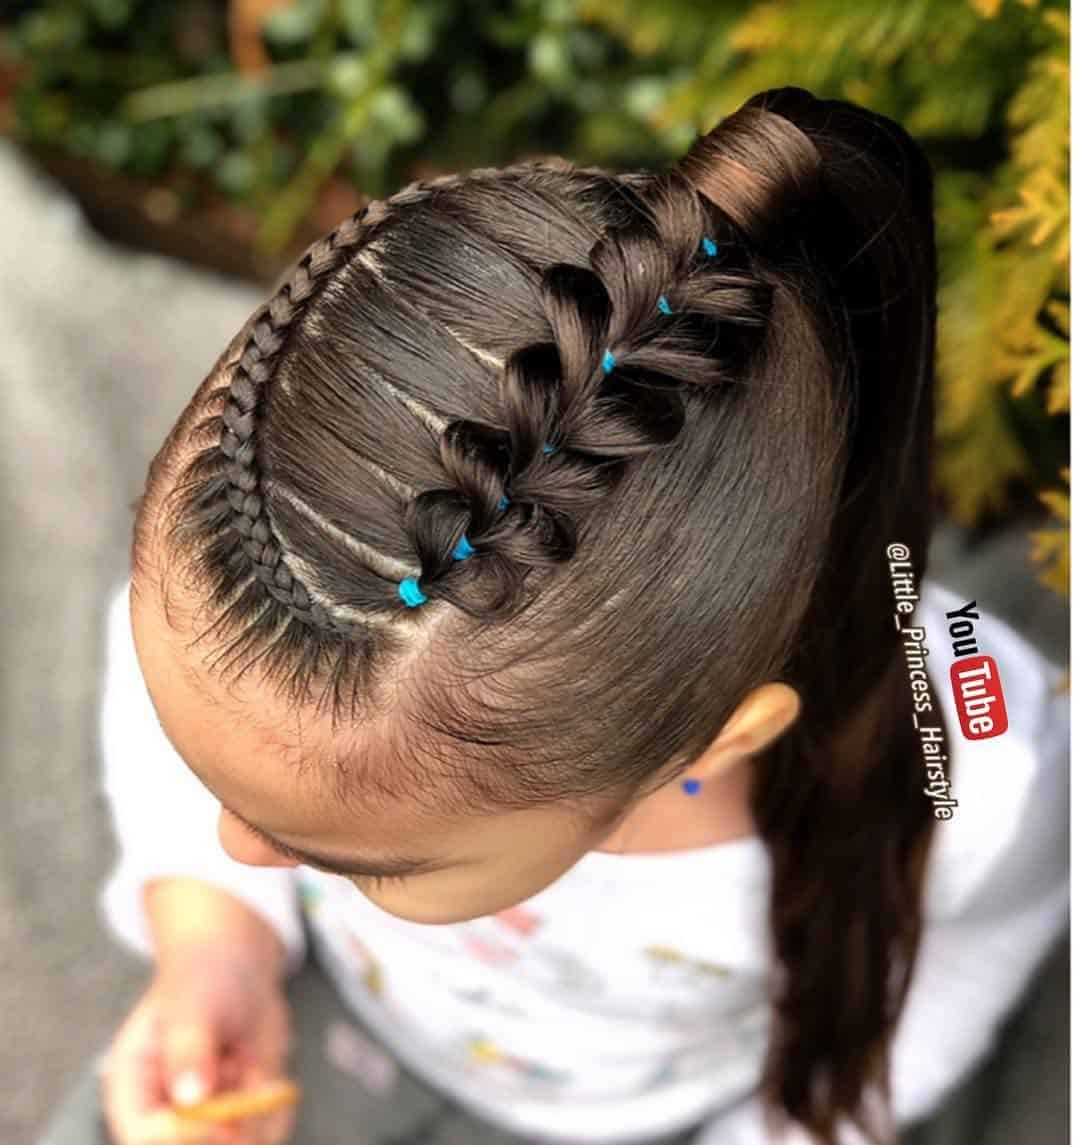 Espectacular peinados para niñas con trenzas Imagen de cortes de pelo tutoriales - 75 Peinados con Trenzas para niñas fáciles paso a paso con ...